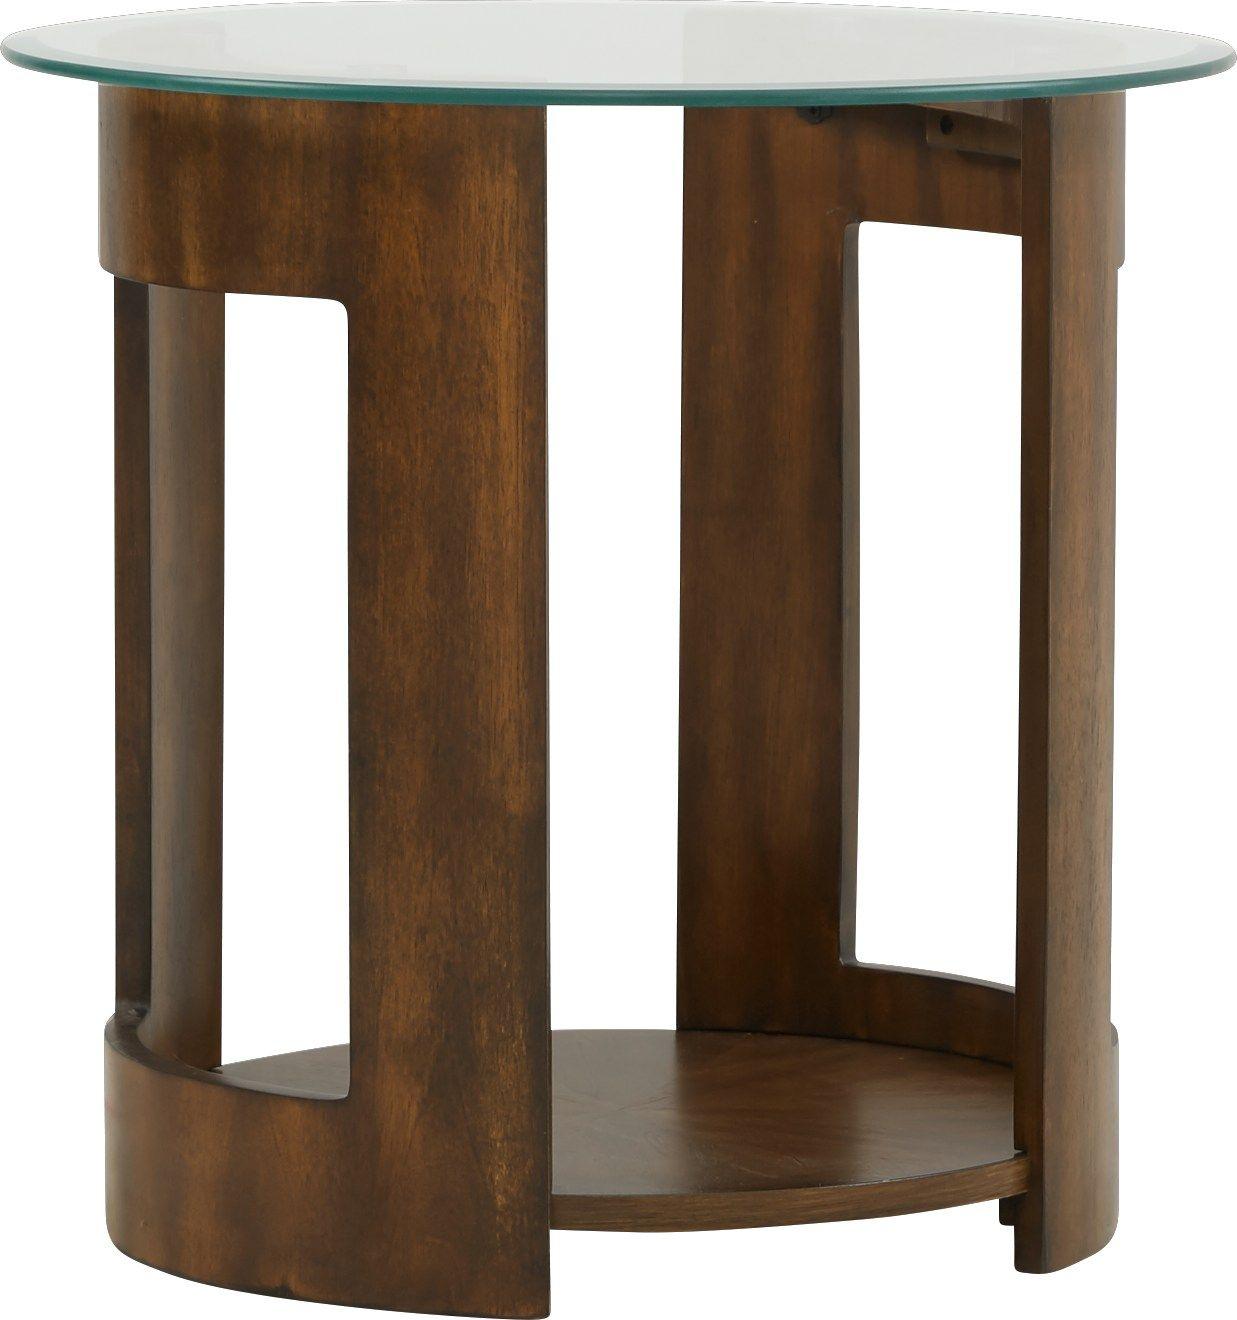 Excellent Eastland Brown Cherry Round End Table In 2019 Rtg Lr Spiritservingveterans Wood Chair Design Ideas Spiritservingveteransorg